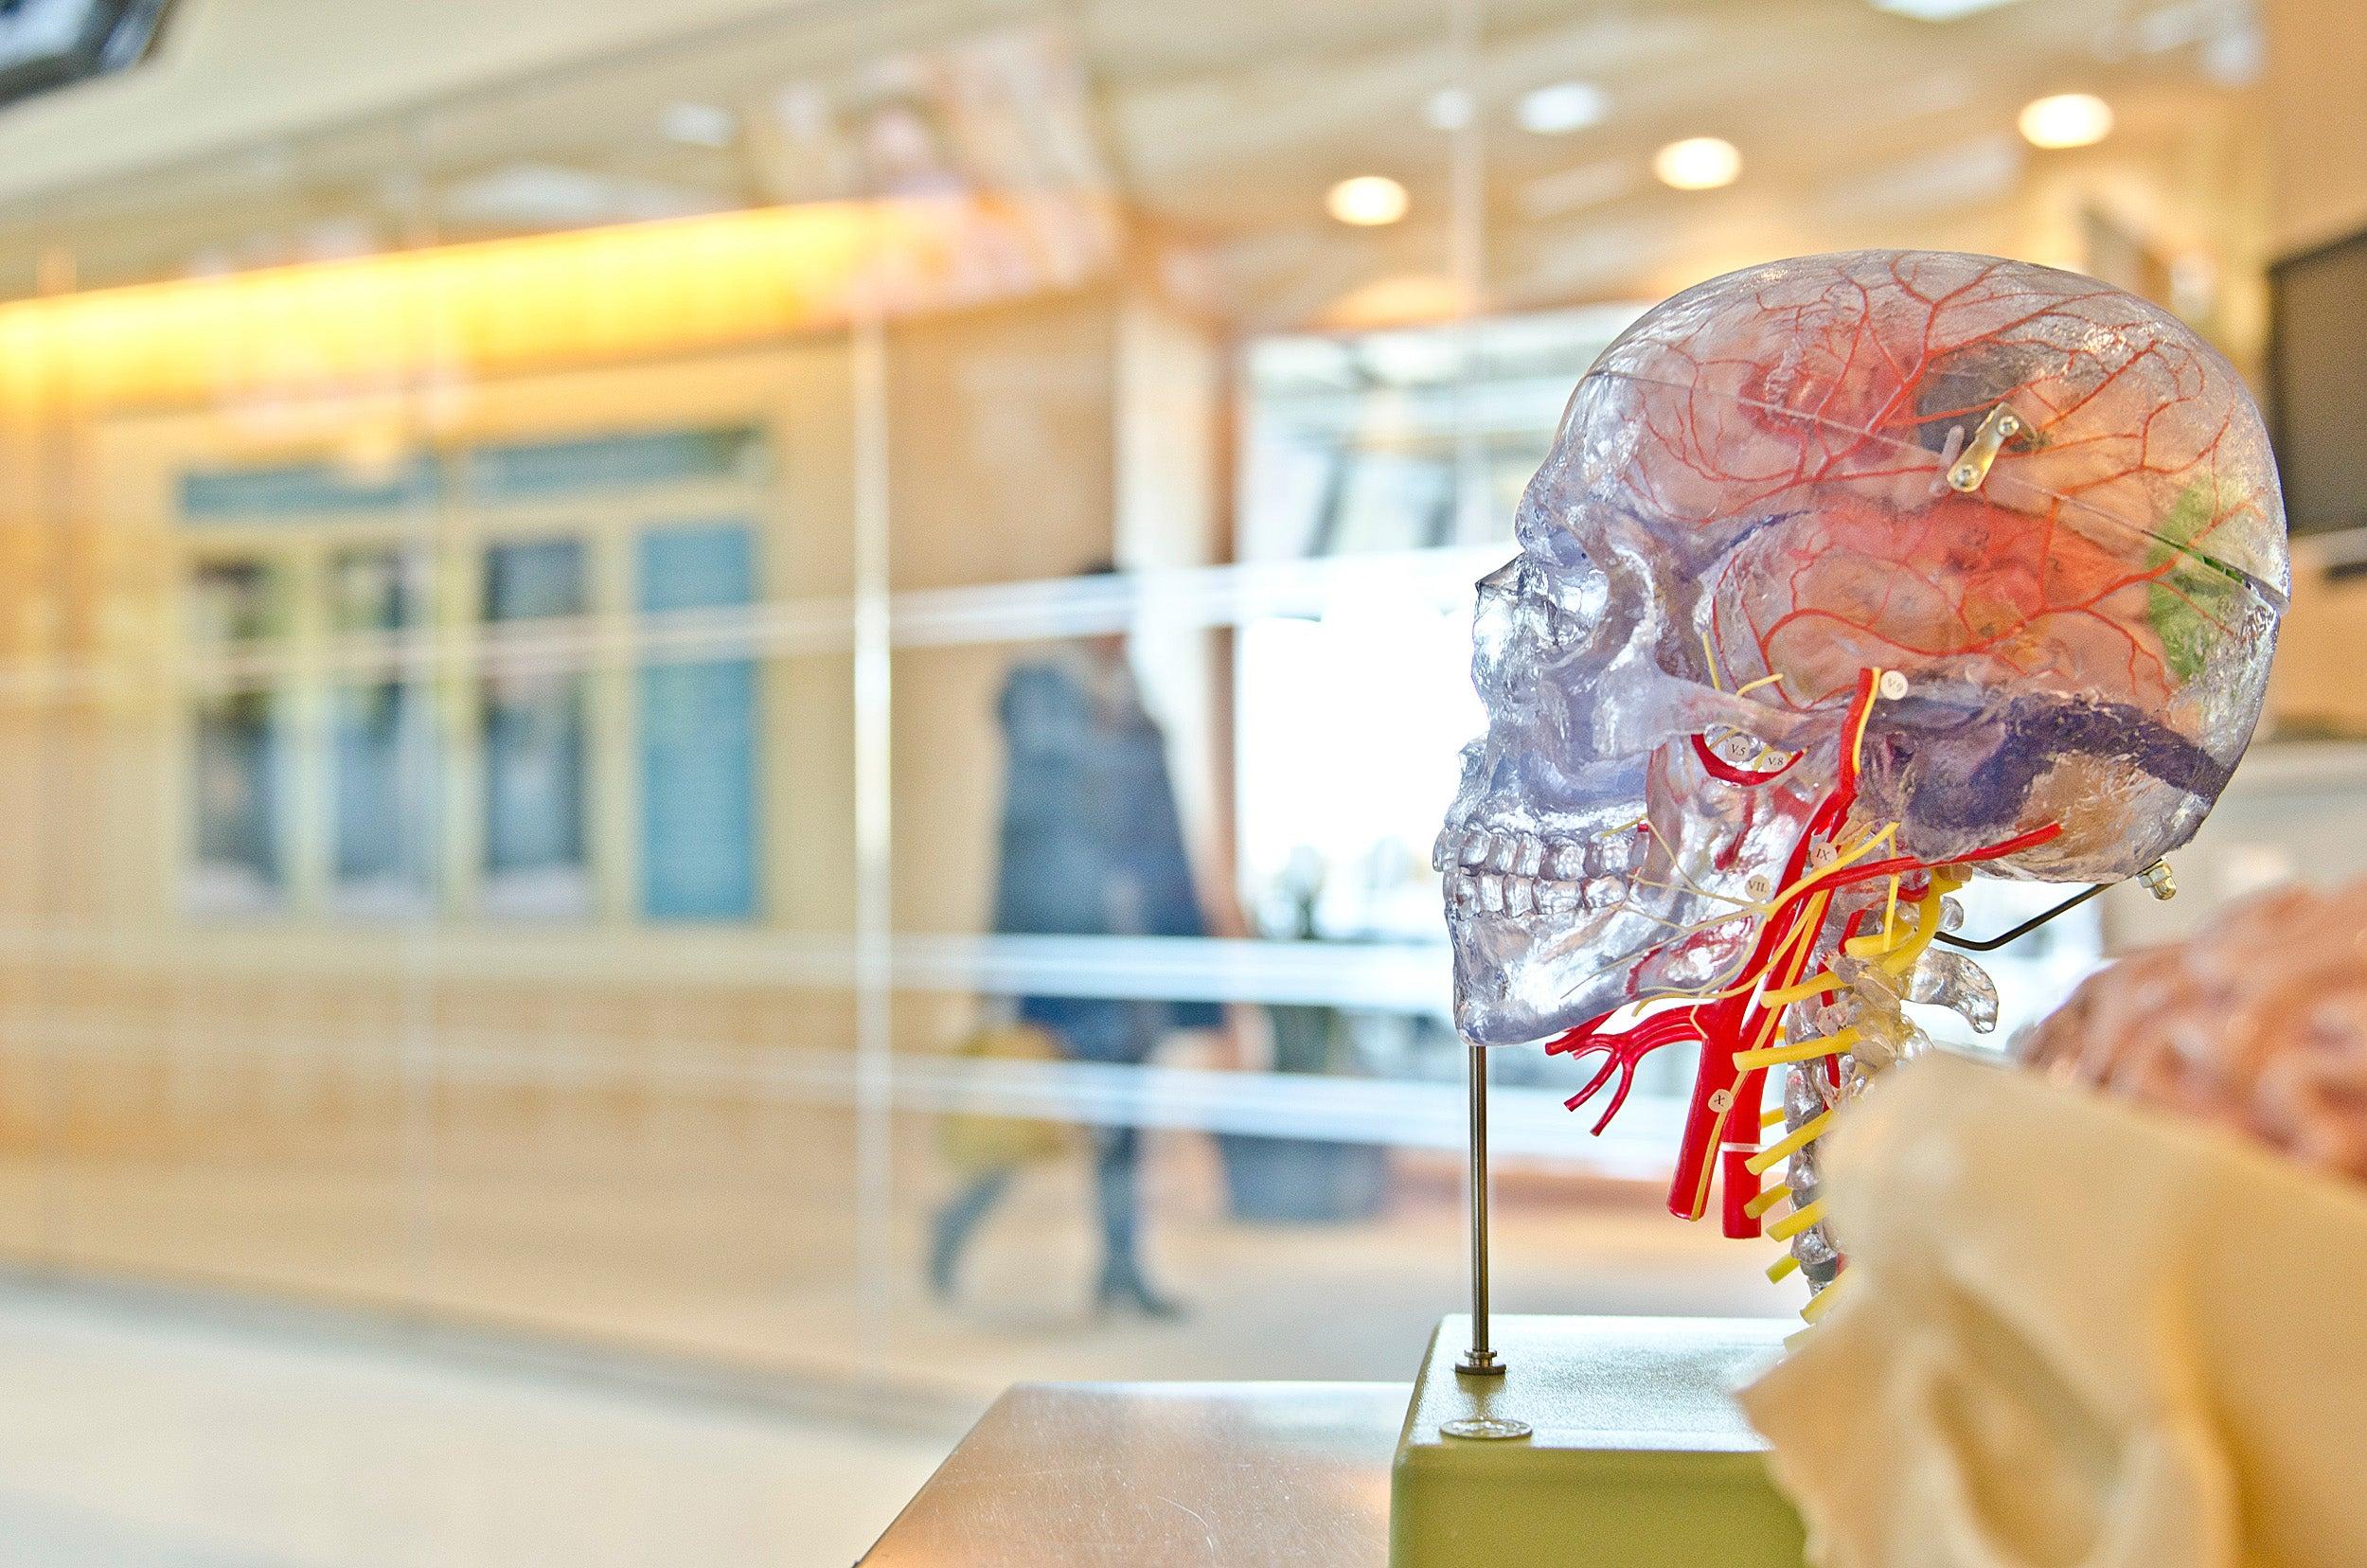 Wyss Institute develops technology to better study blood-brain barrier